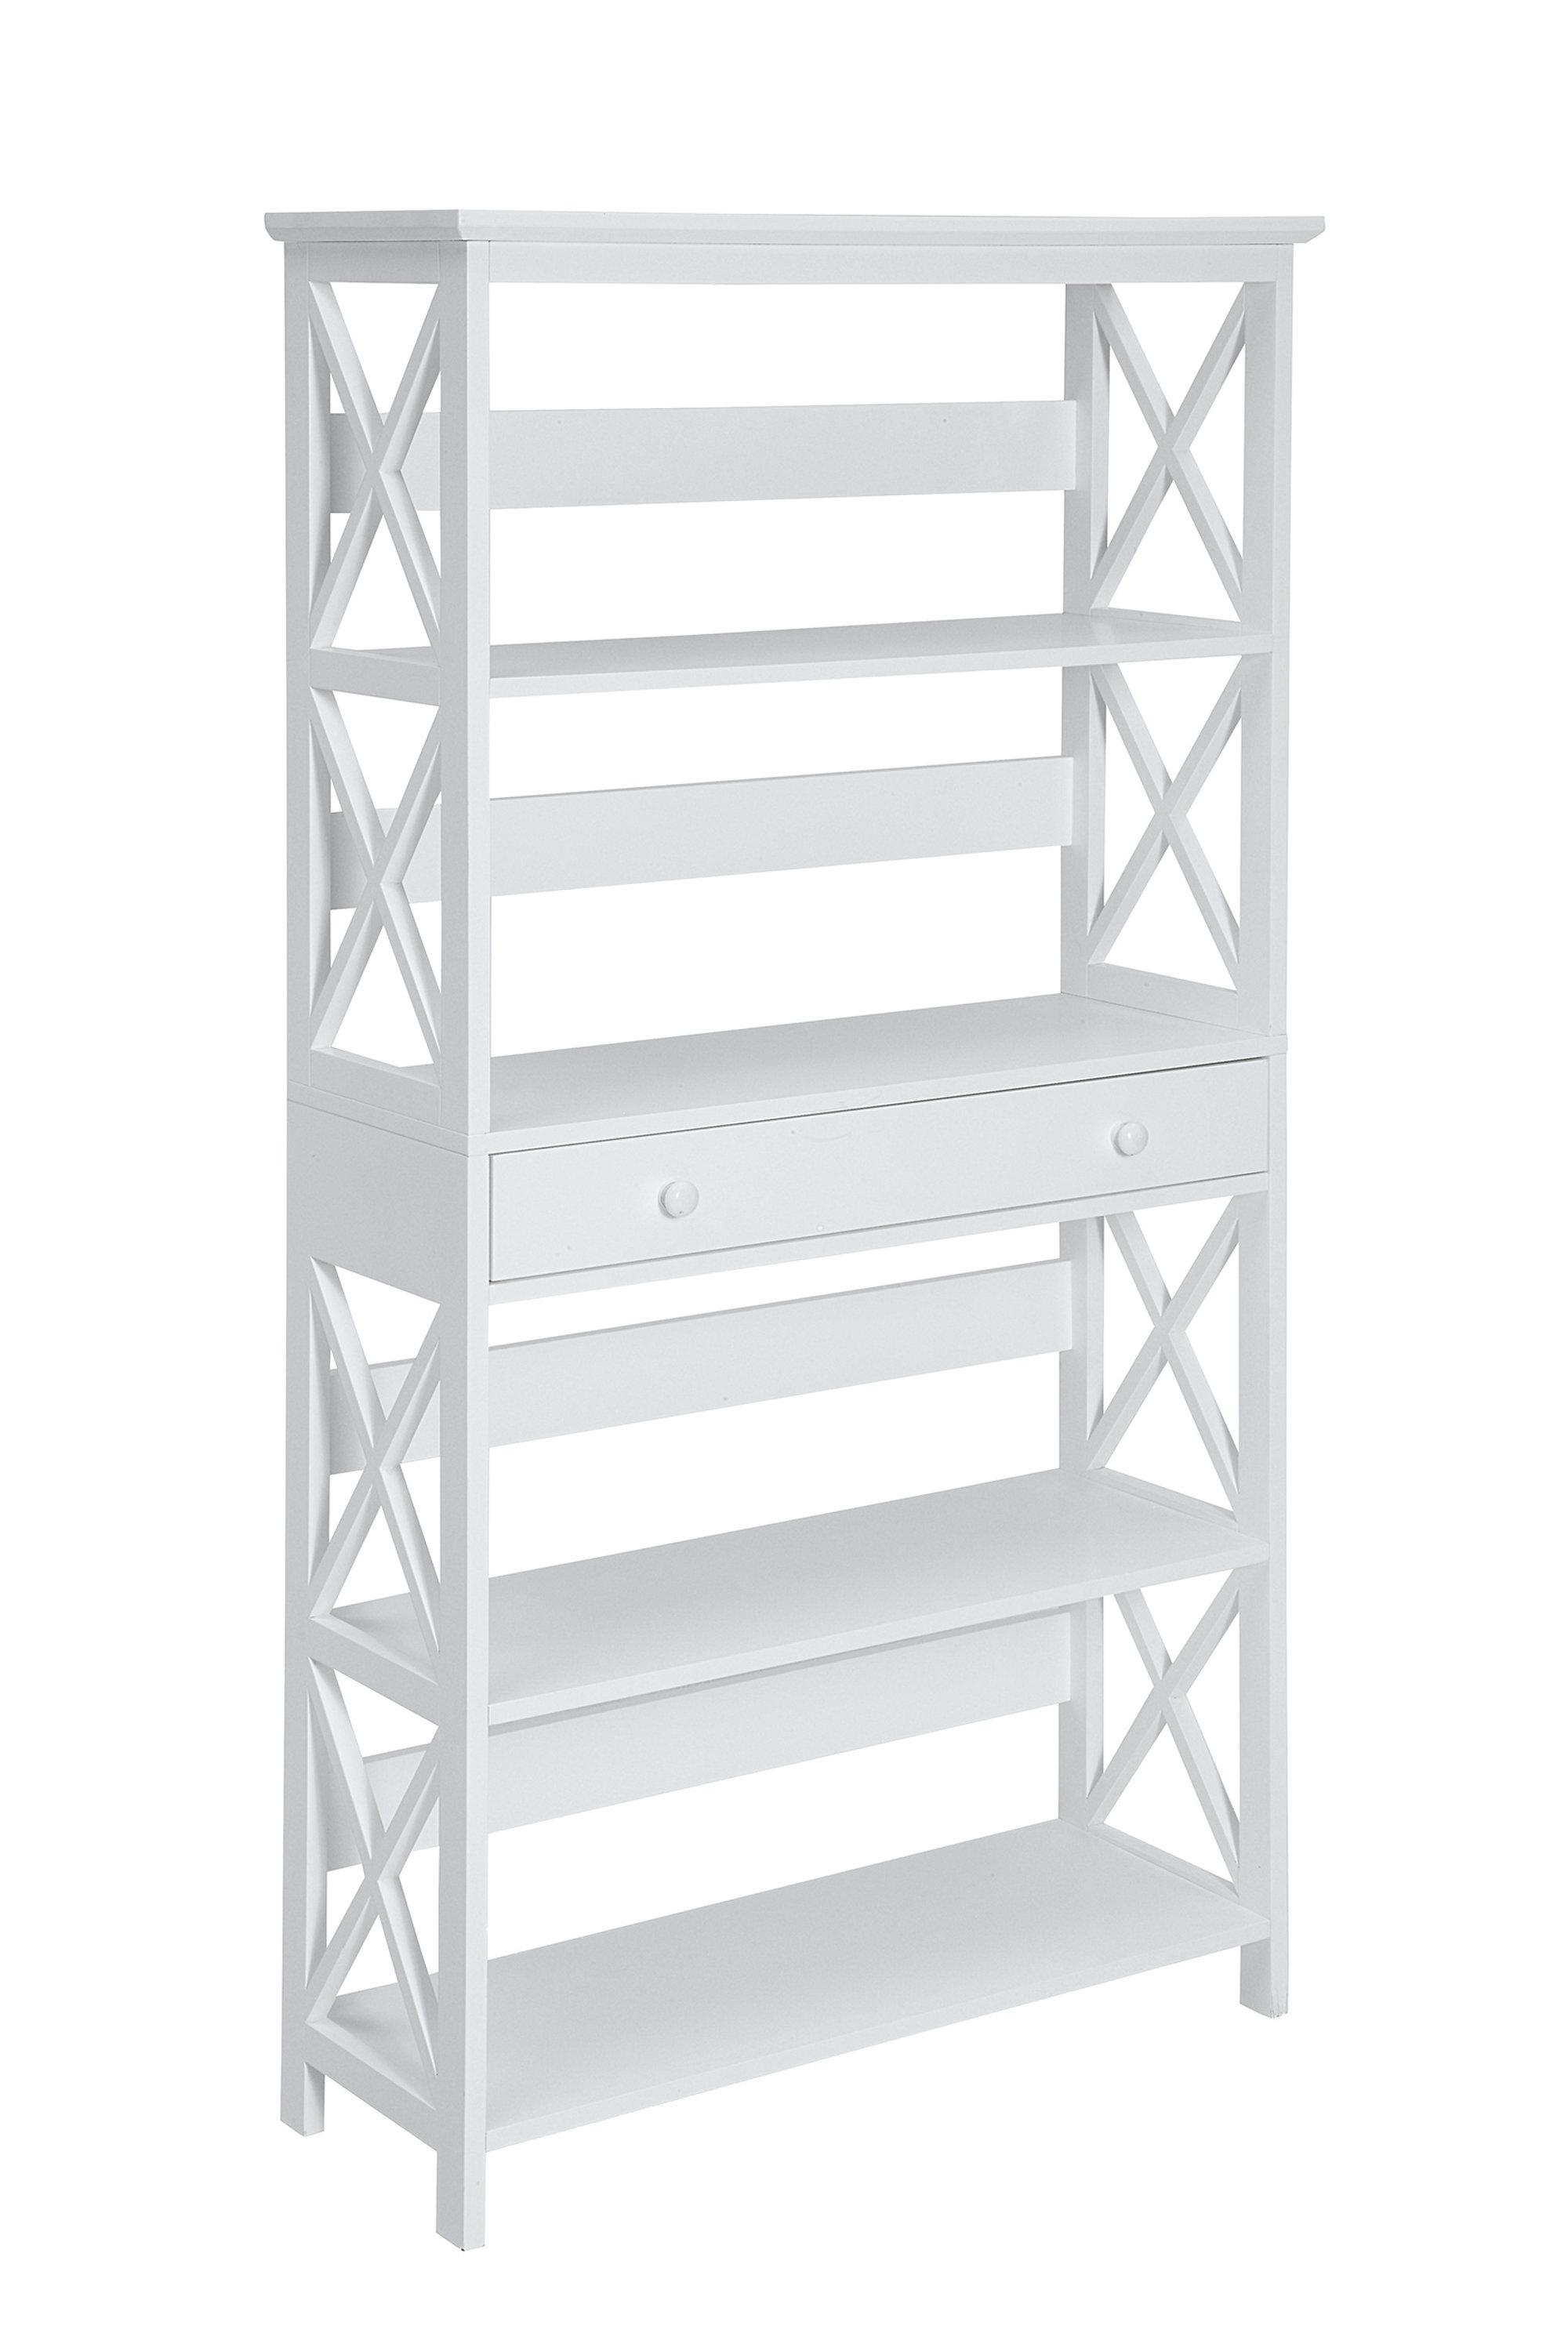 Gracelynn 5 Tier Etagere Bookcase Regarding Most Recently Released Gracelynn 5 Tier Etagere Bookcases (View 7 of 20)